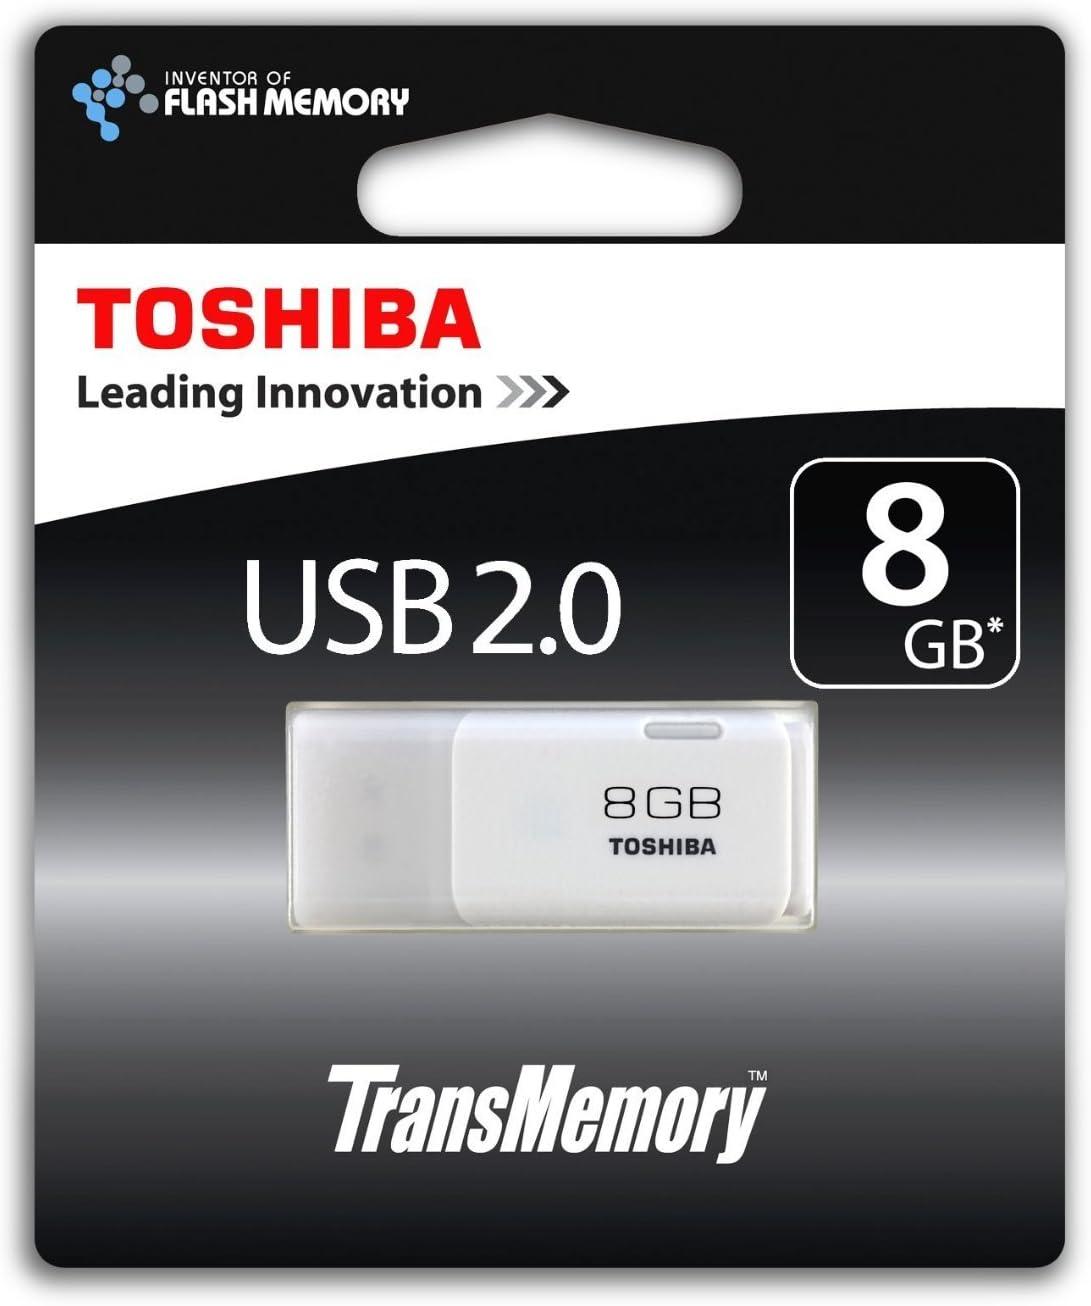 Toshiba Transmemory 32gb Usb 2 0 Stick Weiß Computer Zubehör